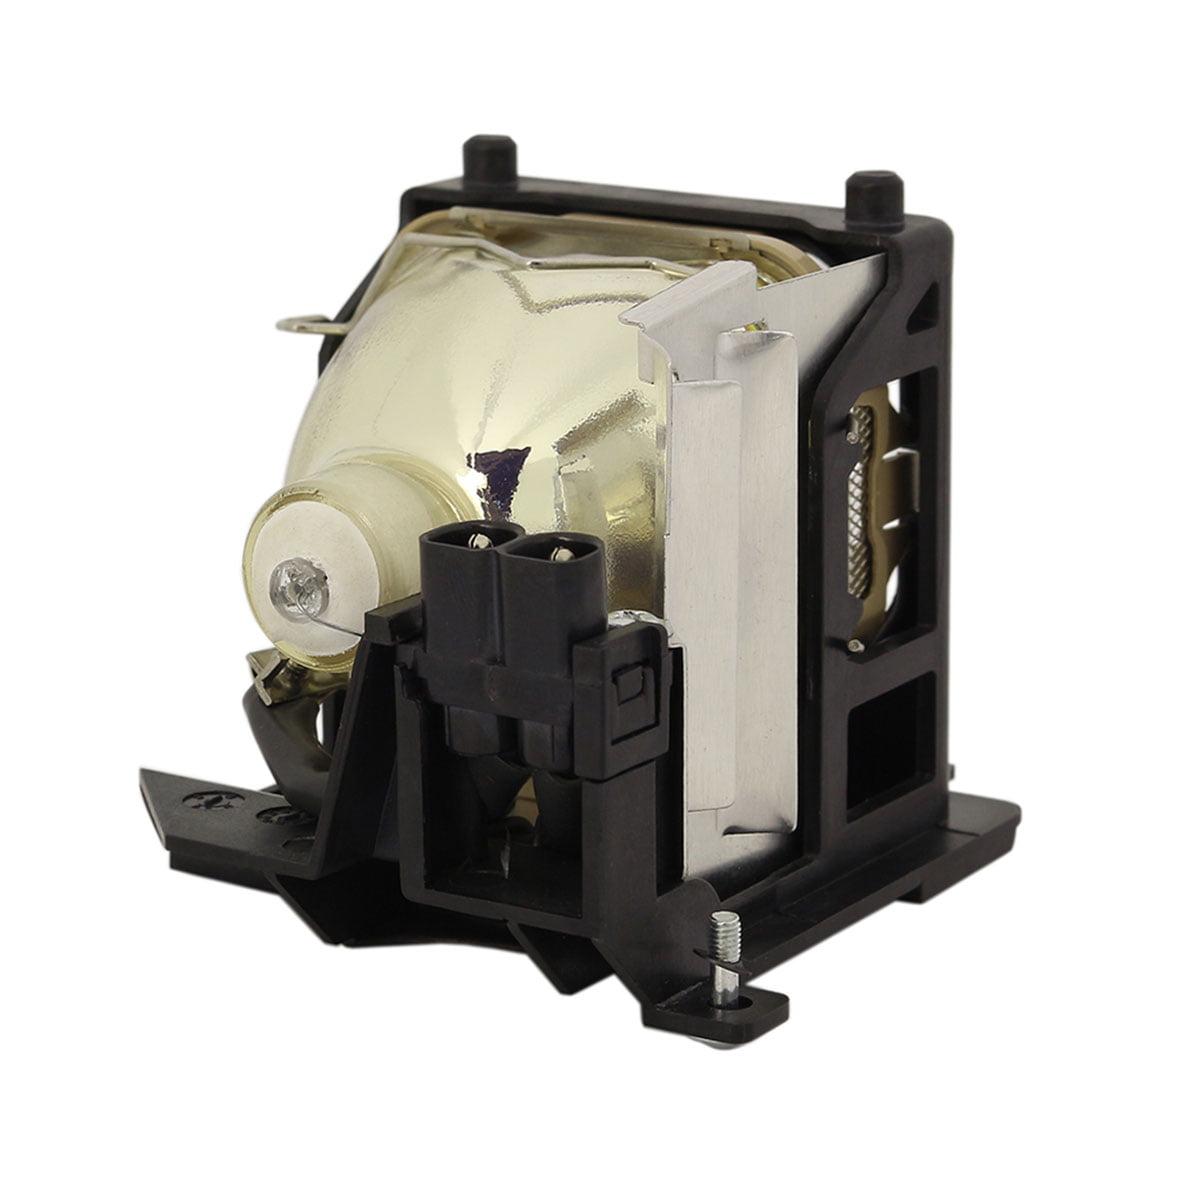 Lutema Platinum for Viewsonic PJ562 Projector Lamp with Housing (Original Philips Bulb Inside) - image 3 de 5